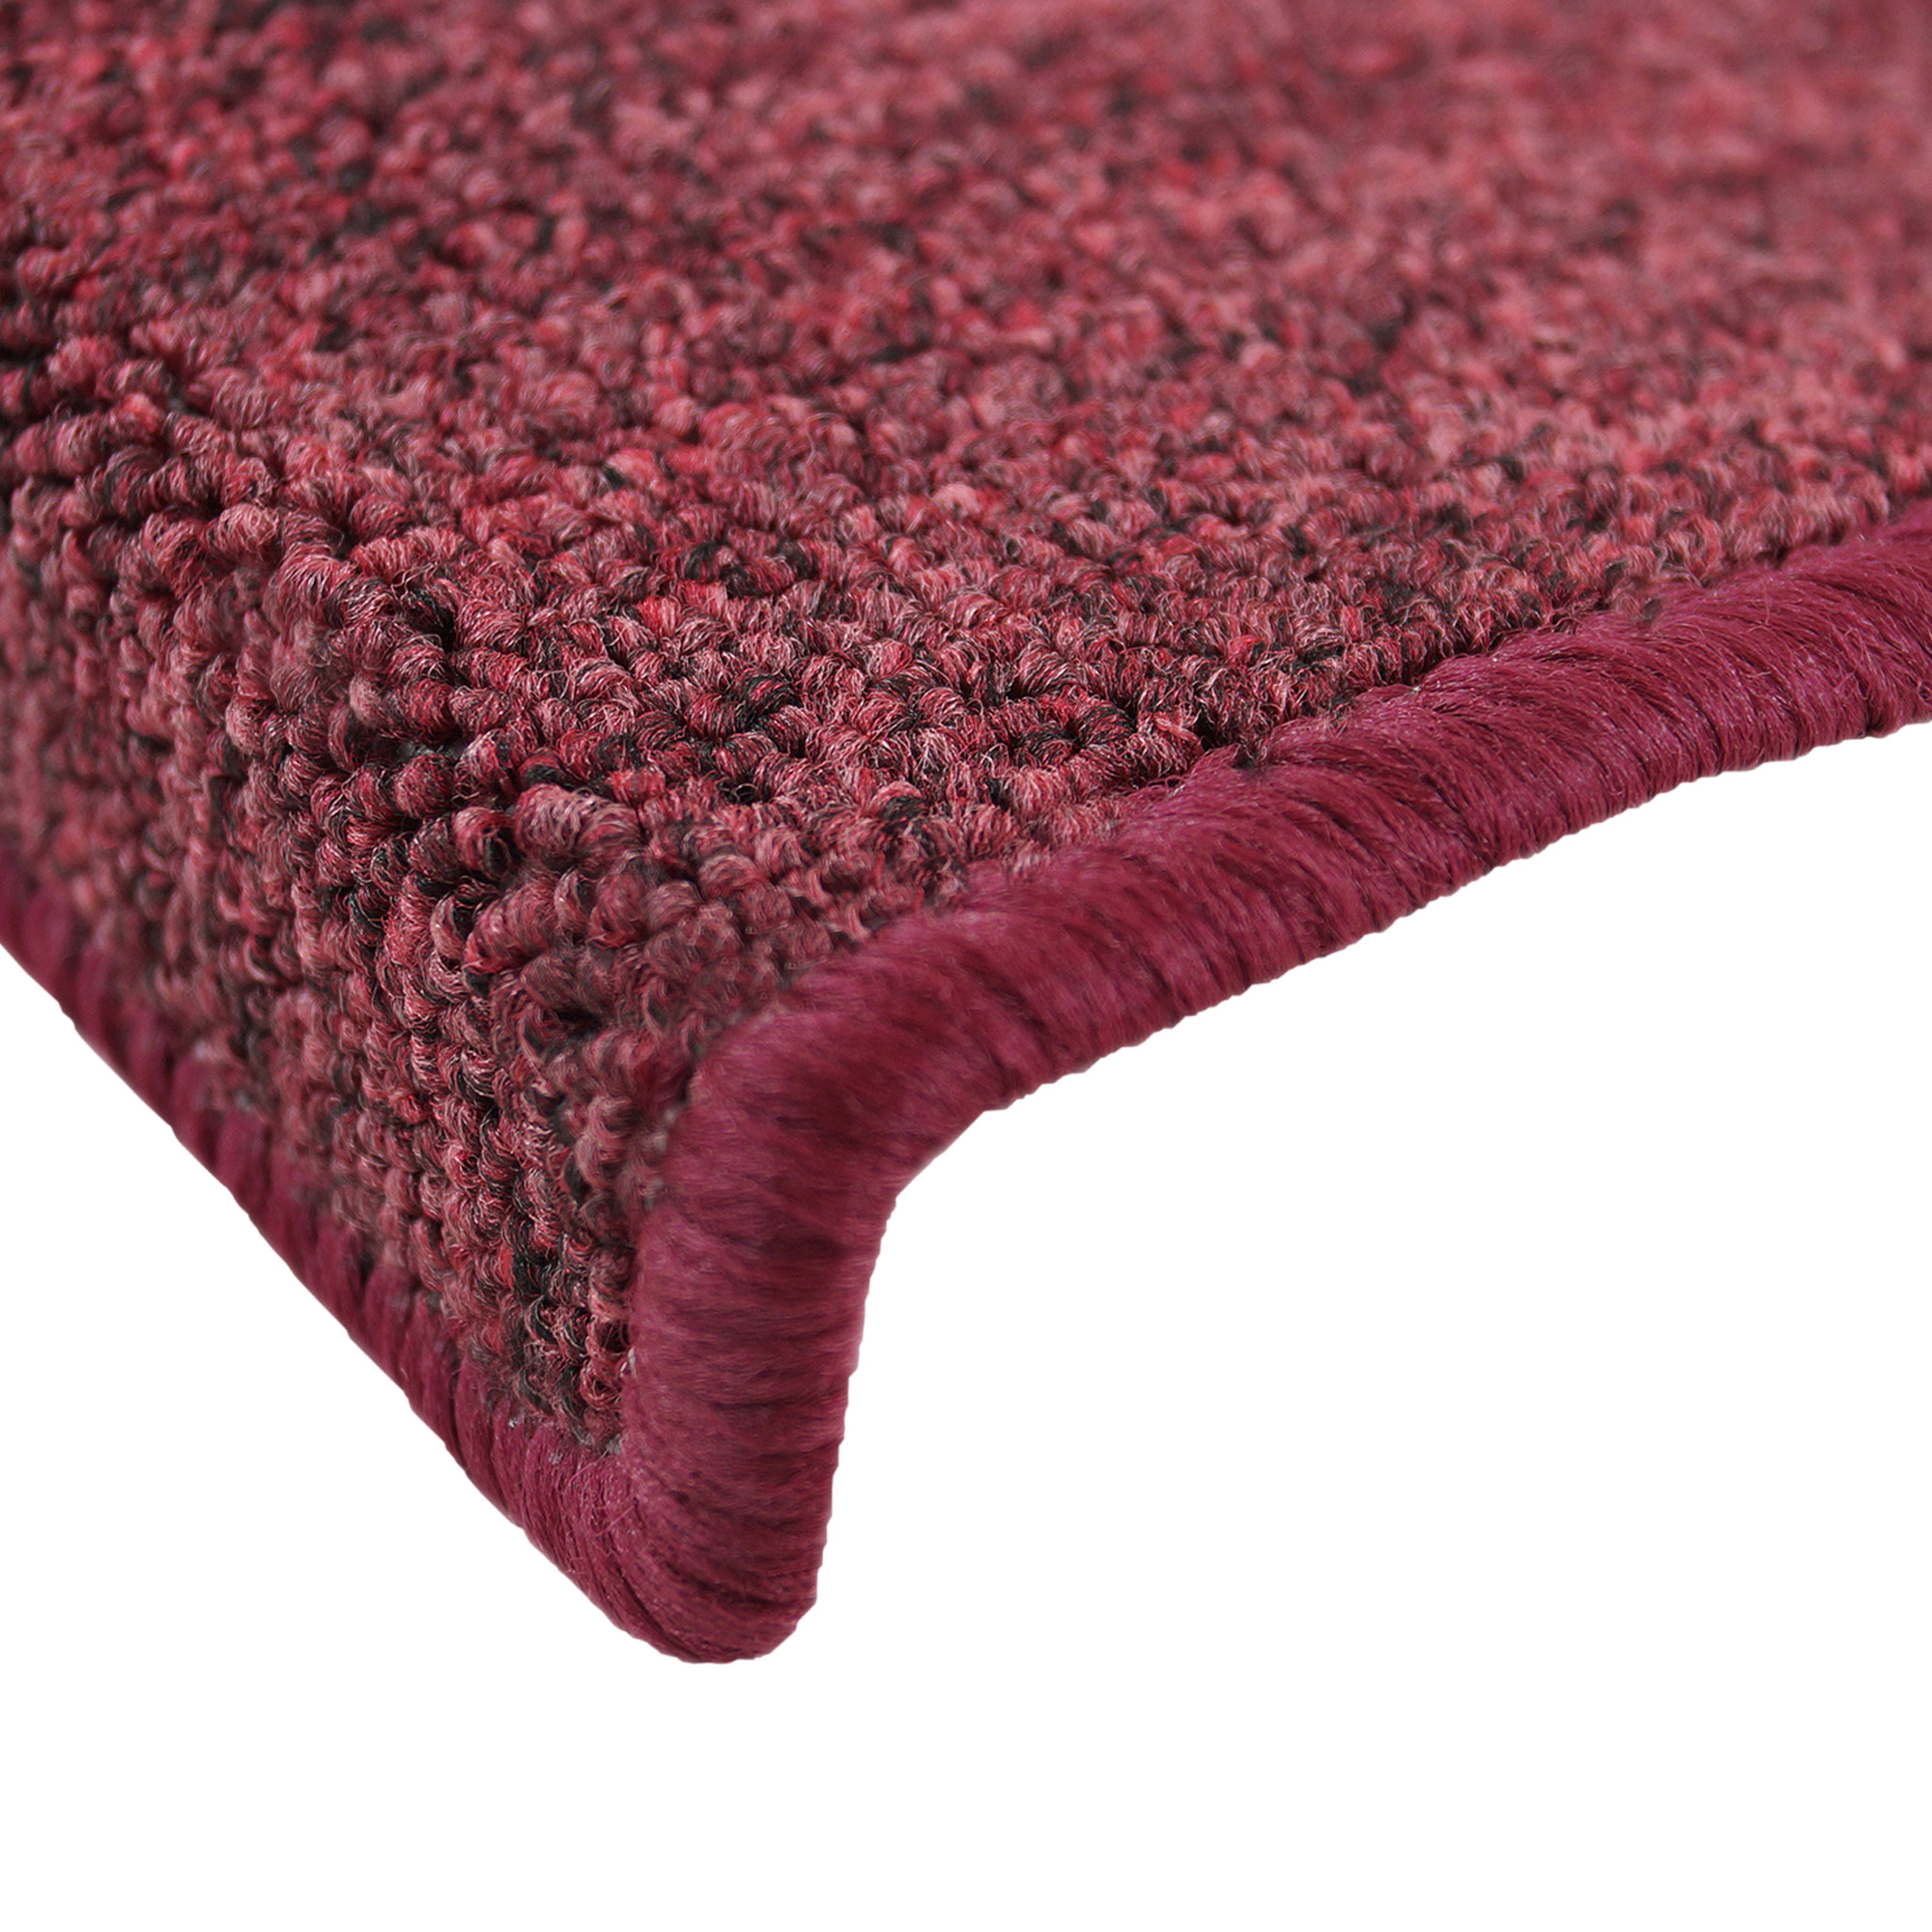 kleine stufenmatten 15er set schmale treppenmatte 55x15 cm treppenschoner treppe ebay. Black Bedroom Furniture Sets. Home Design Ideas